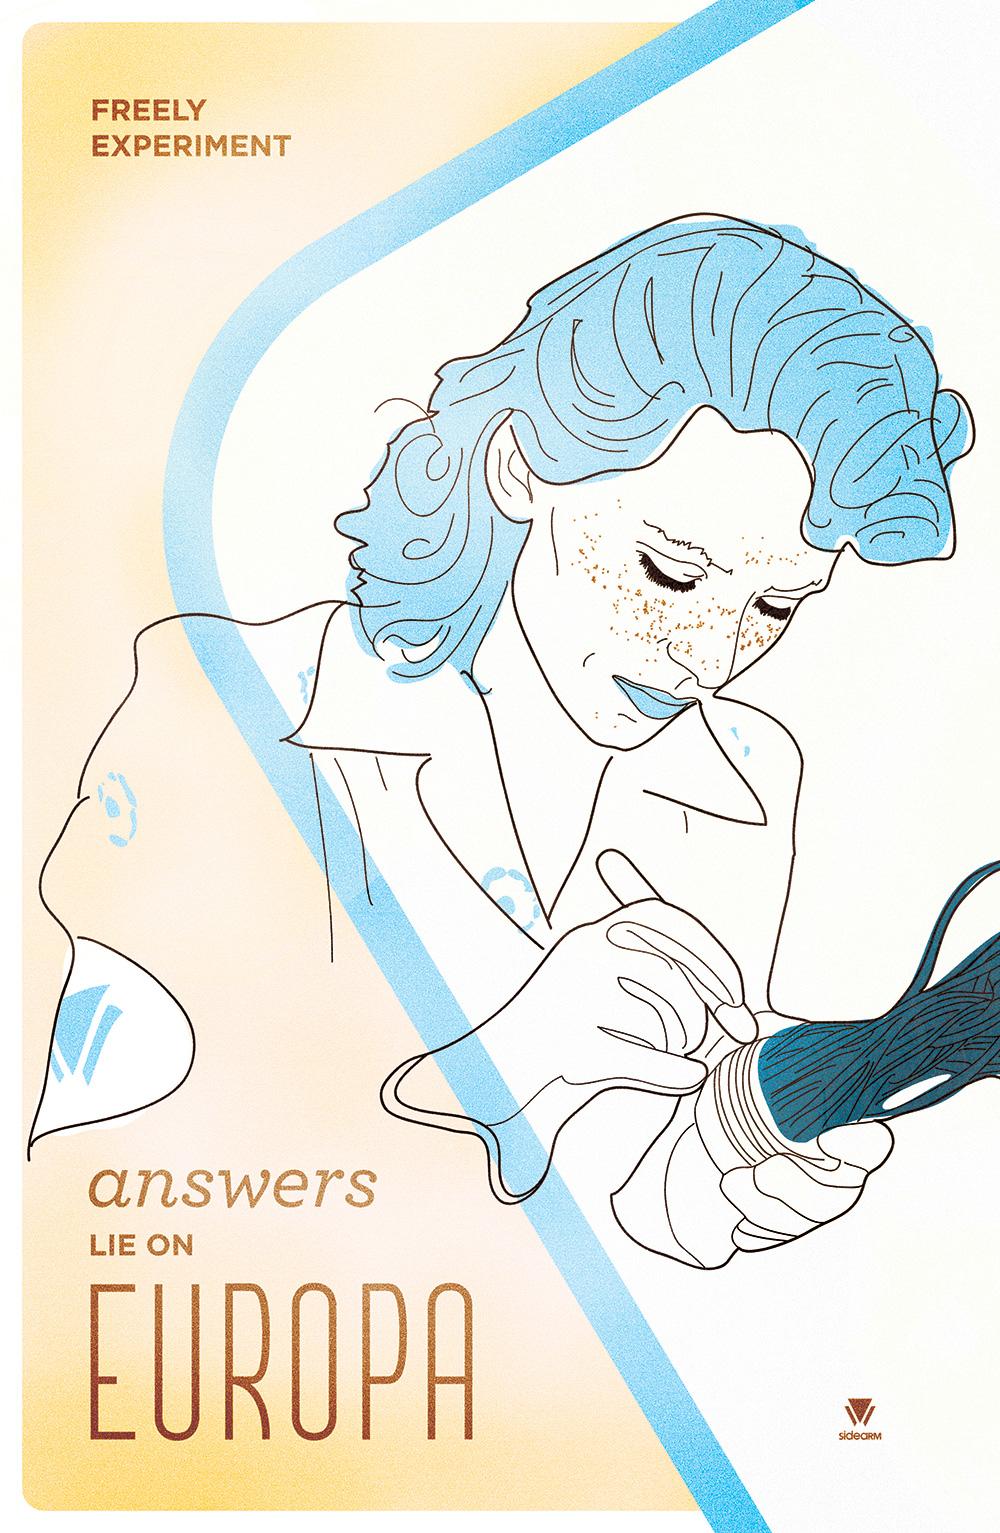 europa_answers